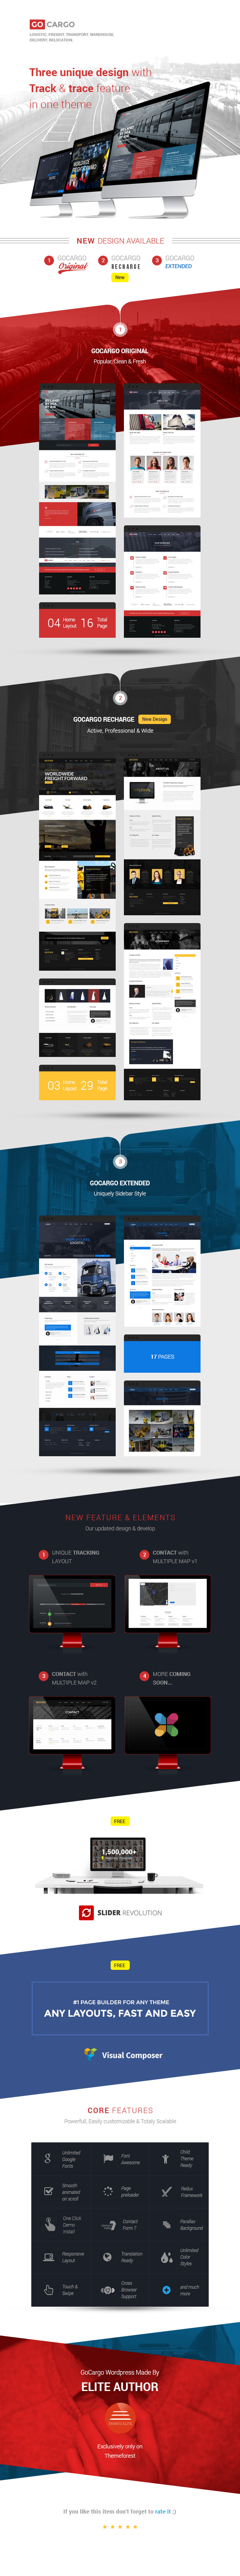 gocargo features wp - GoCargo - Freight, Logistics & Transportation WordPress Theme